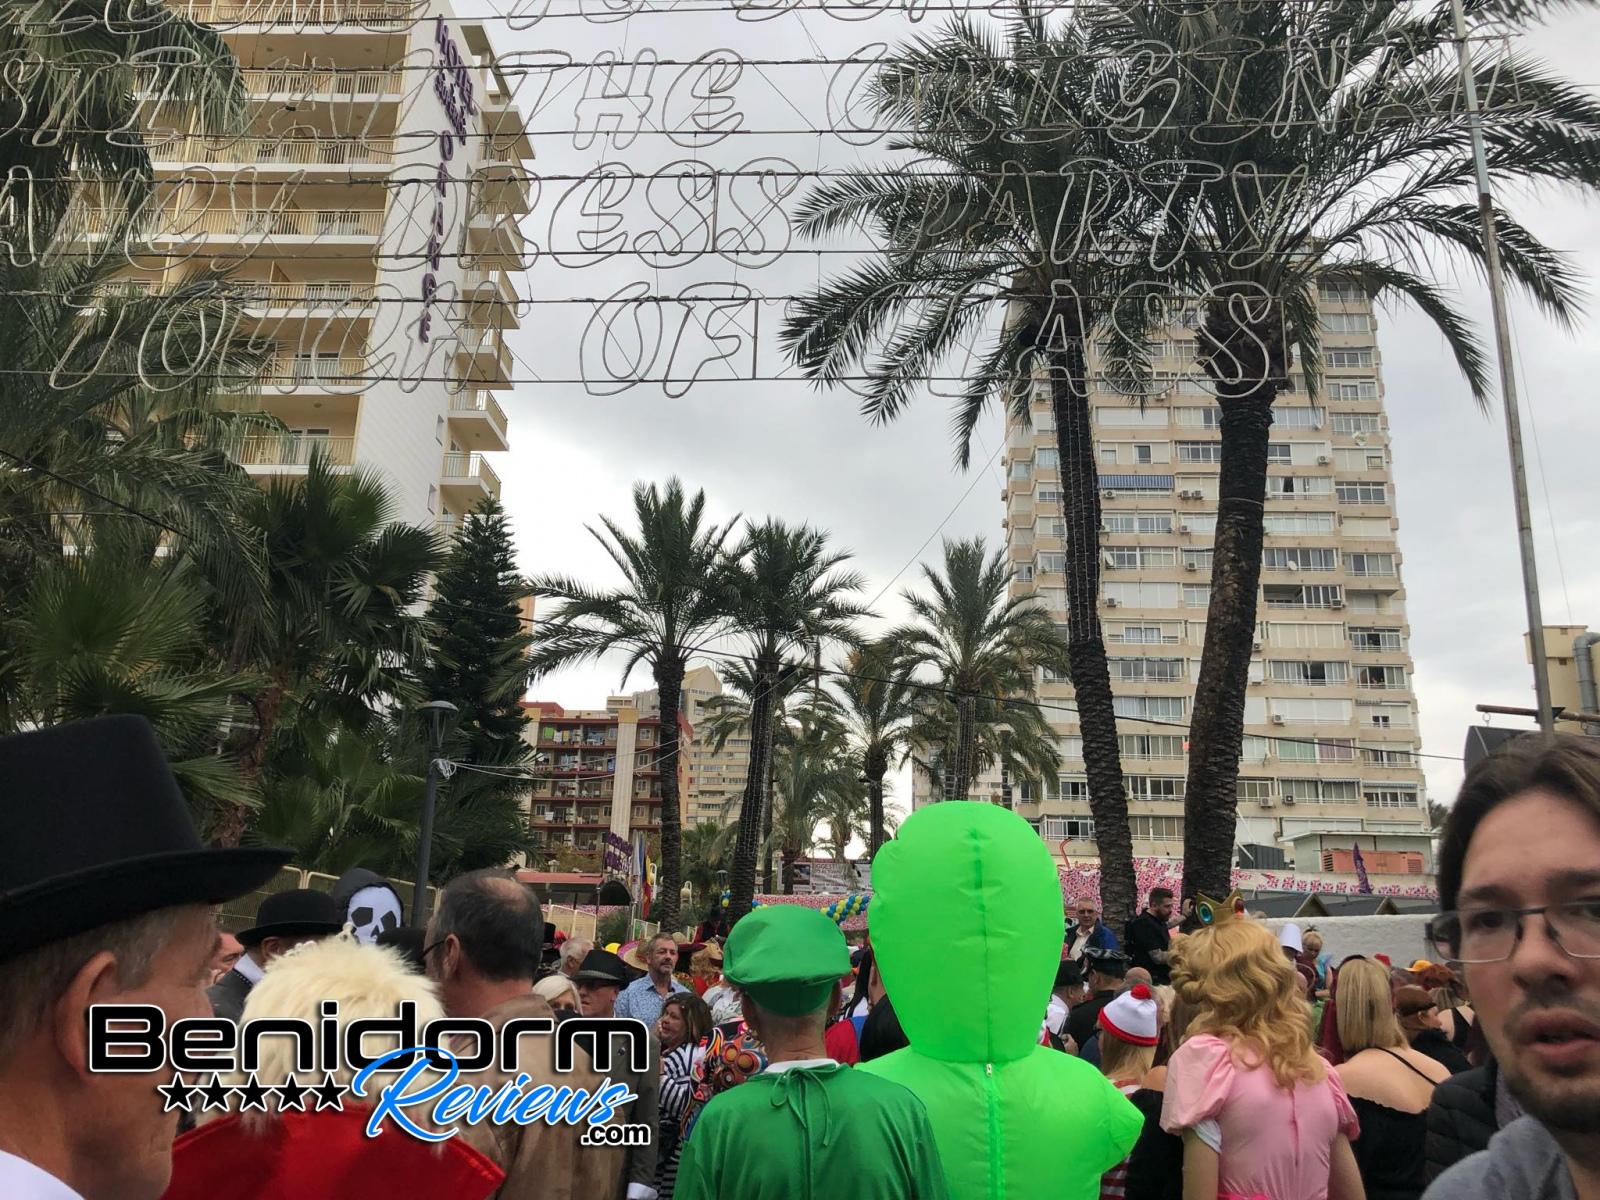 Benidorm-Fiestas-2019-Fancy-Dress-257